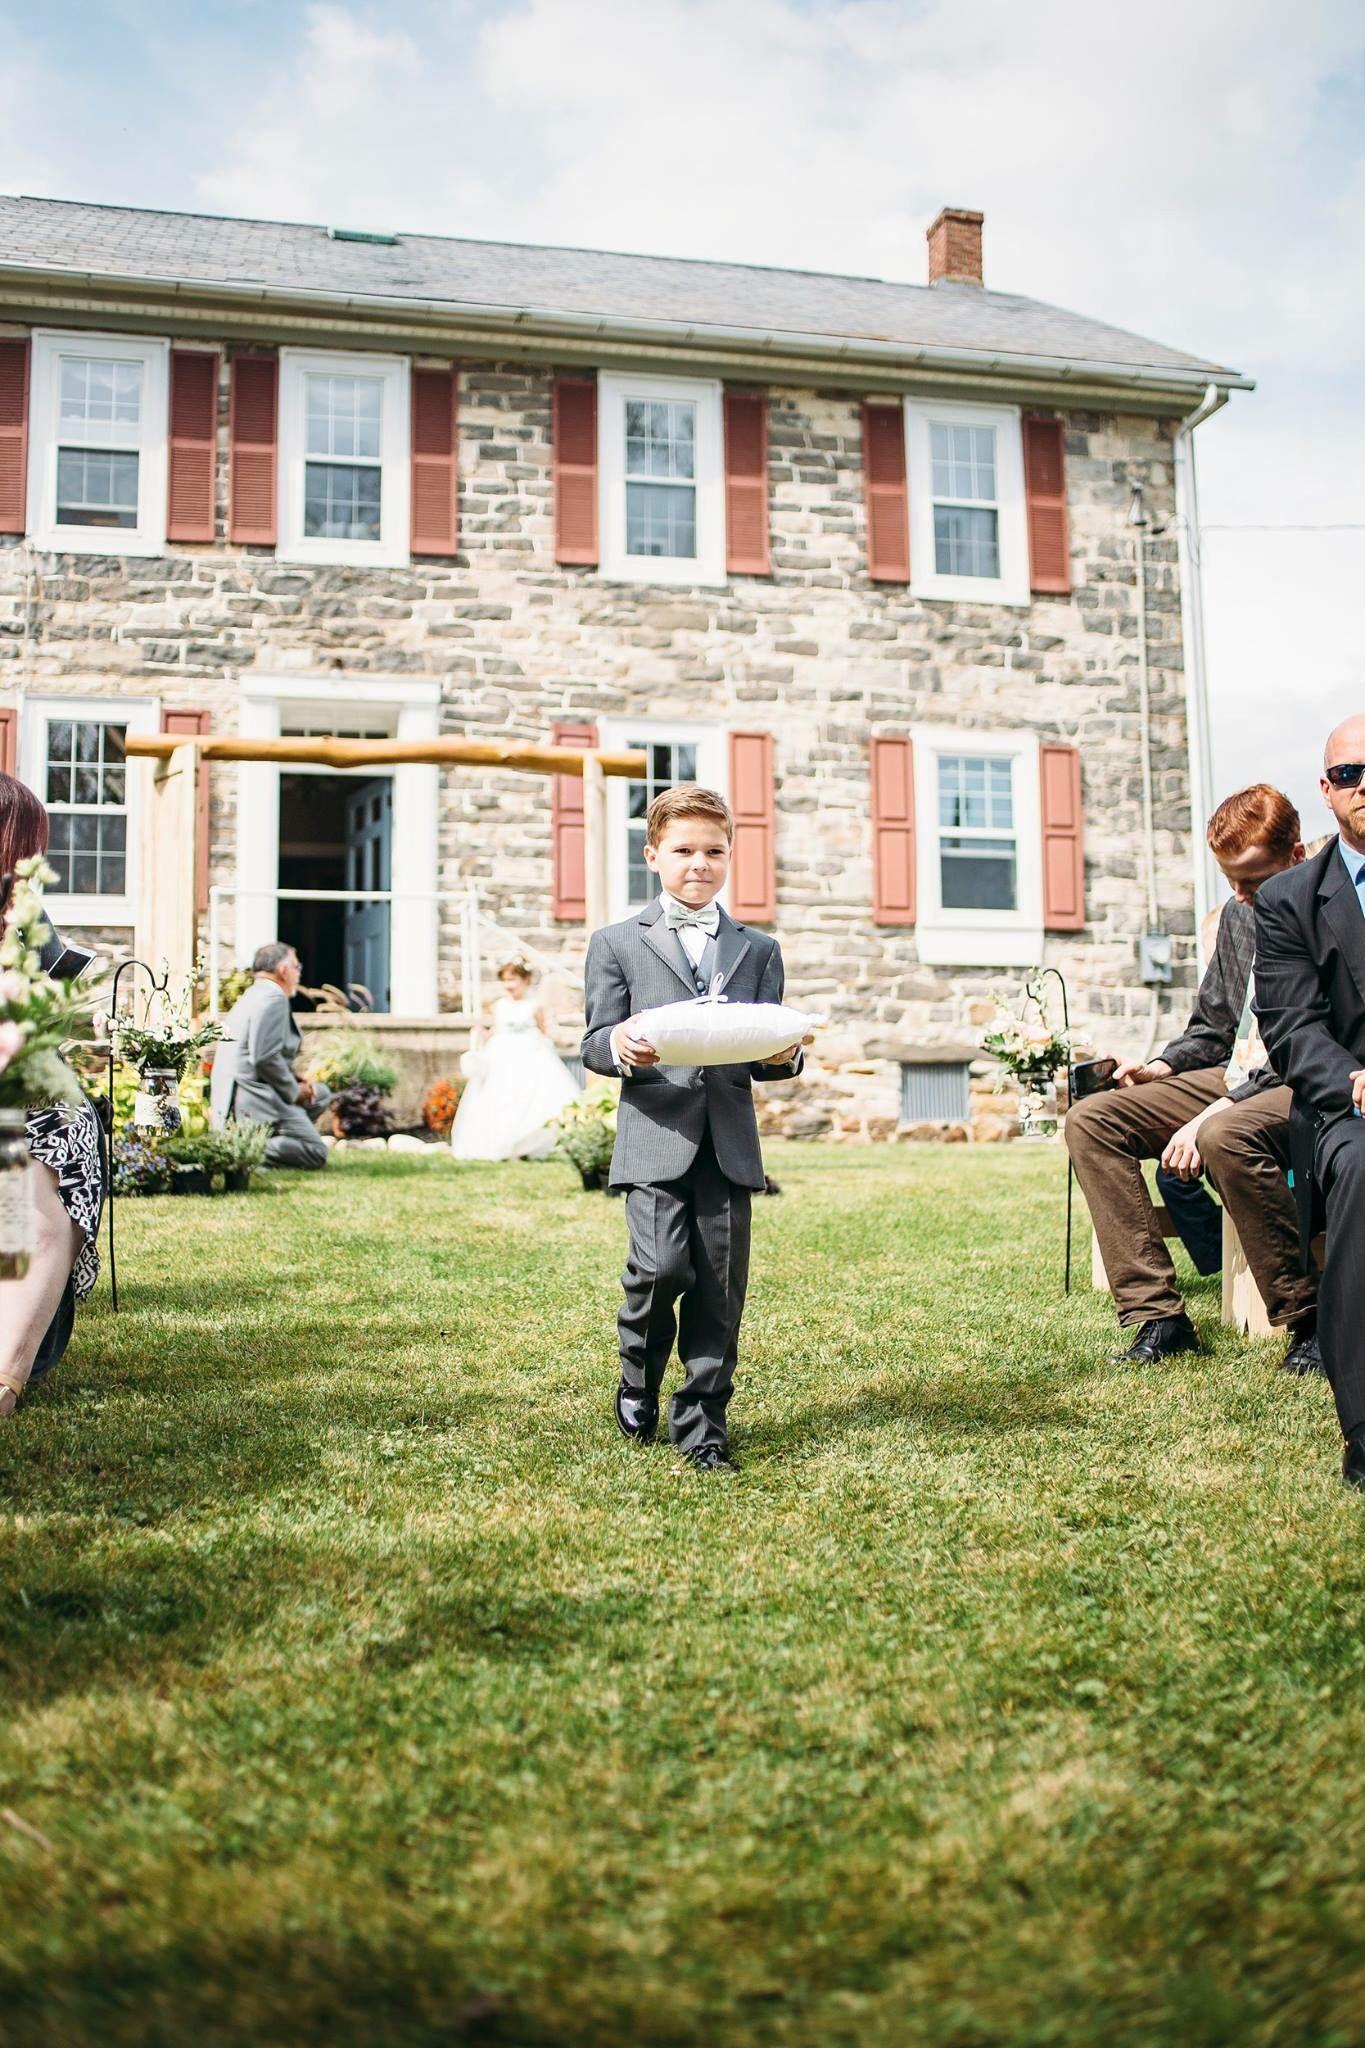 Our wedding! Barn Swallow Farm. Located in Lehigh Valley ...